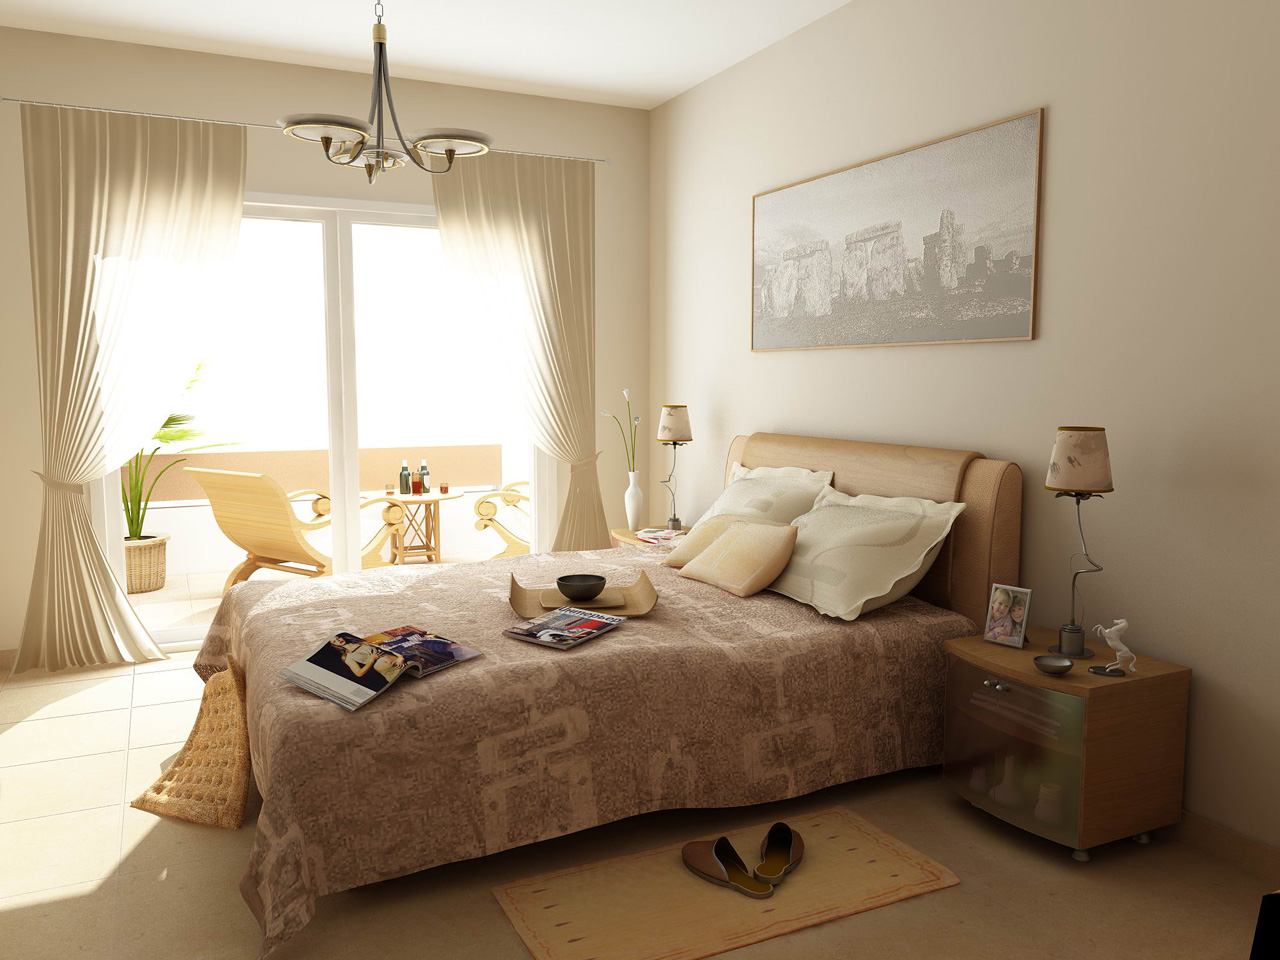 luxury bedroom natural lighting interior design ideas